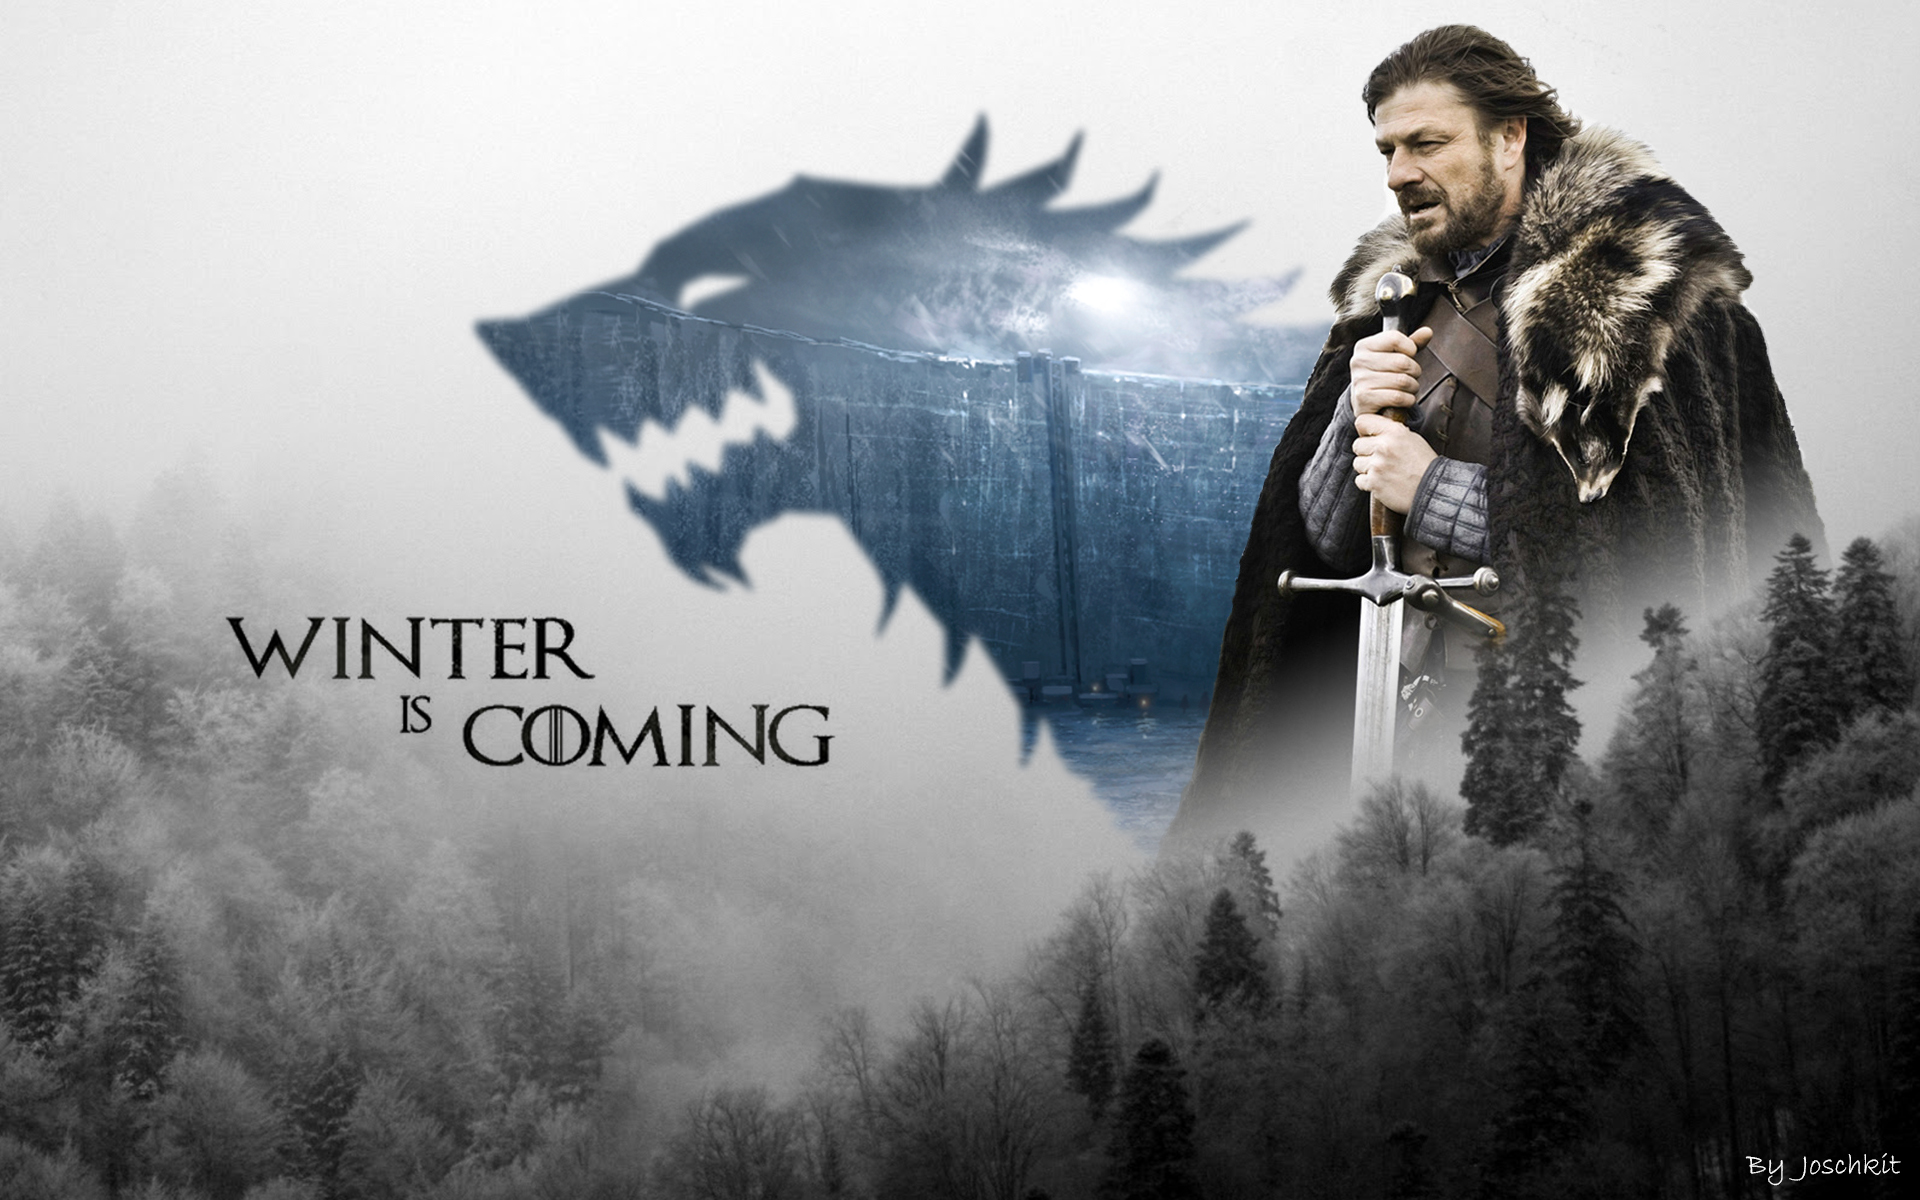 Game of Thrones Wallpaper Eddard Stark by Joschkit 1920x1200